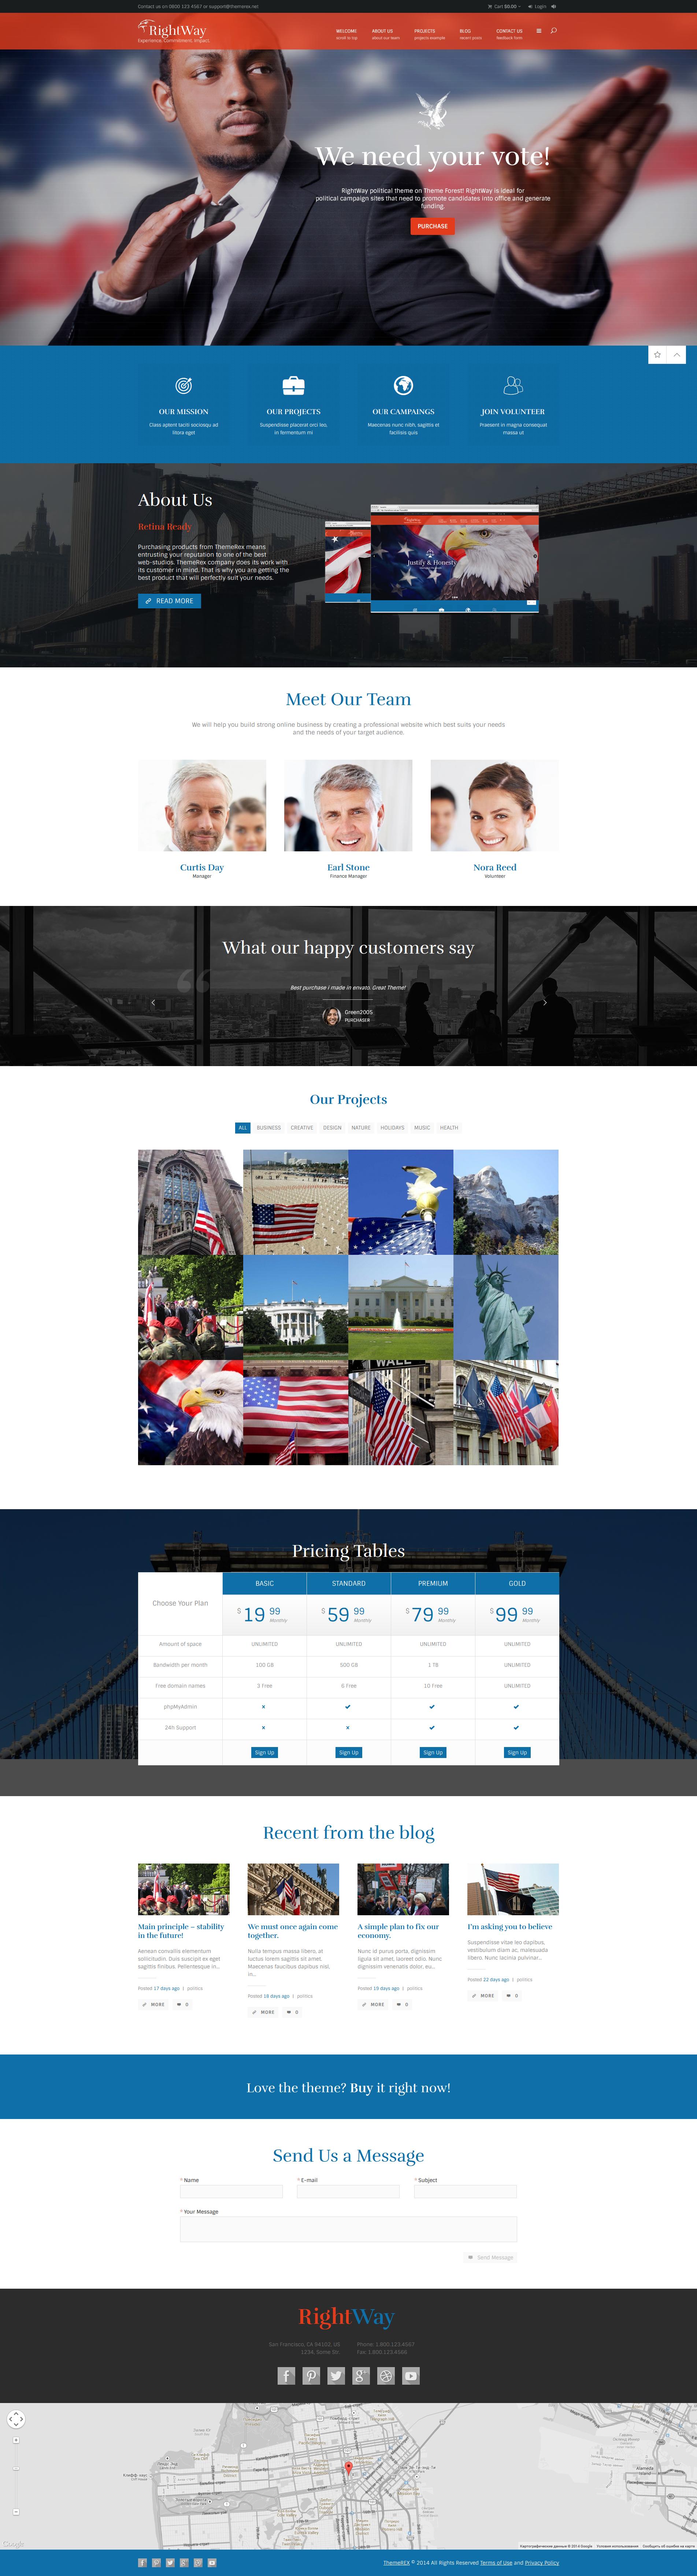 Right Way | Political WordPress Theme by ThemeREX | ThemeForest